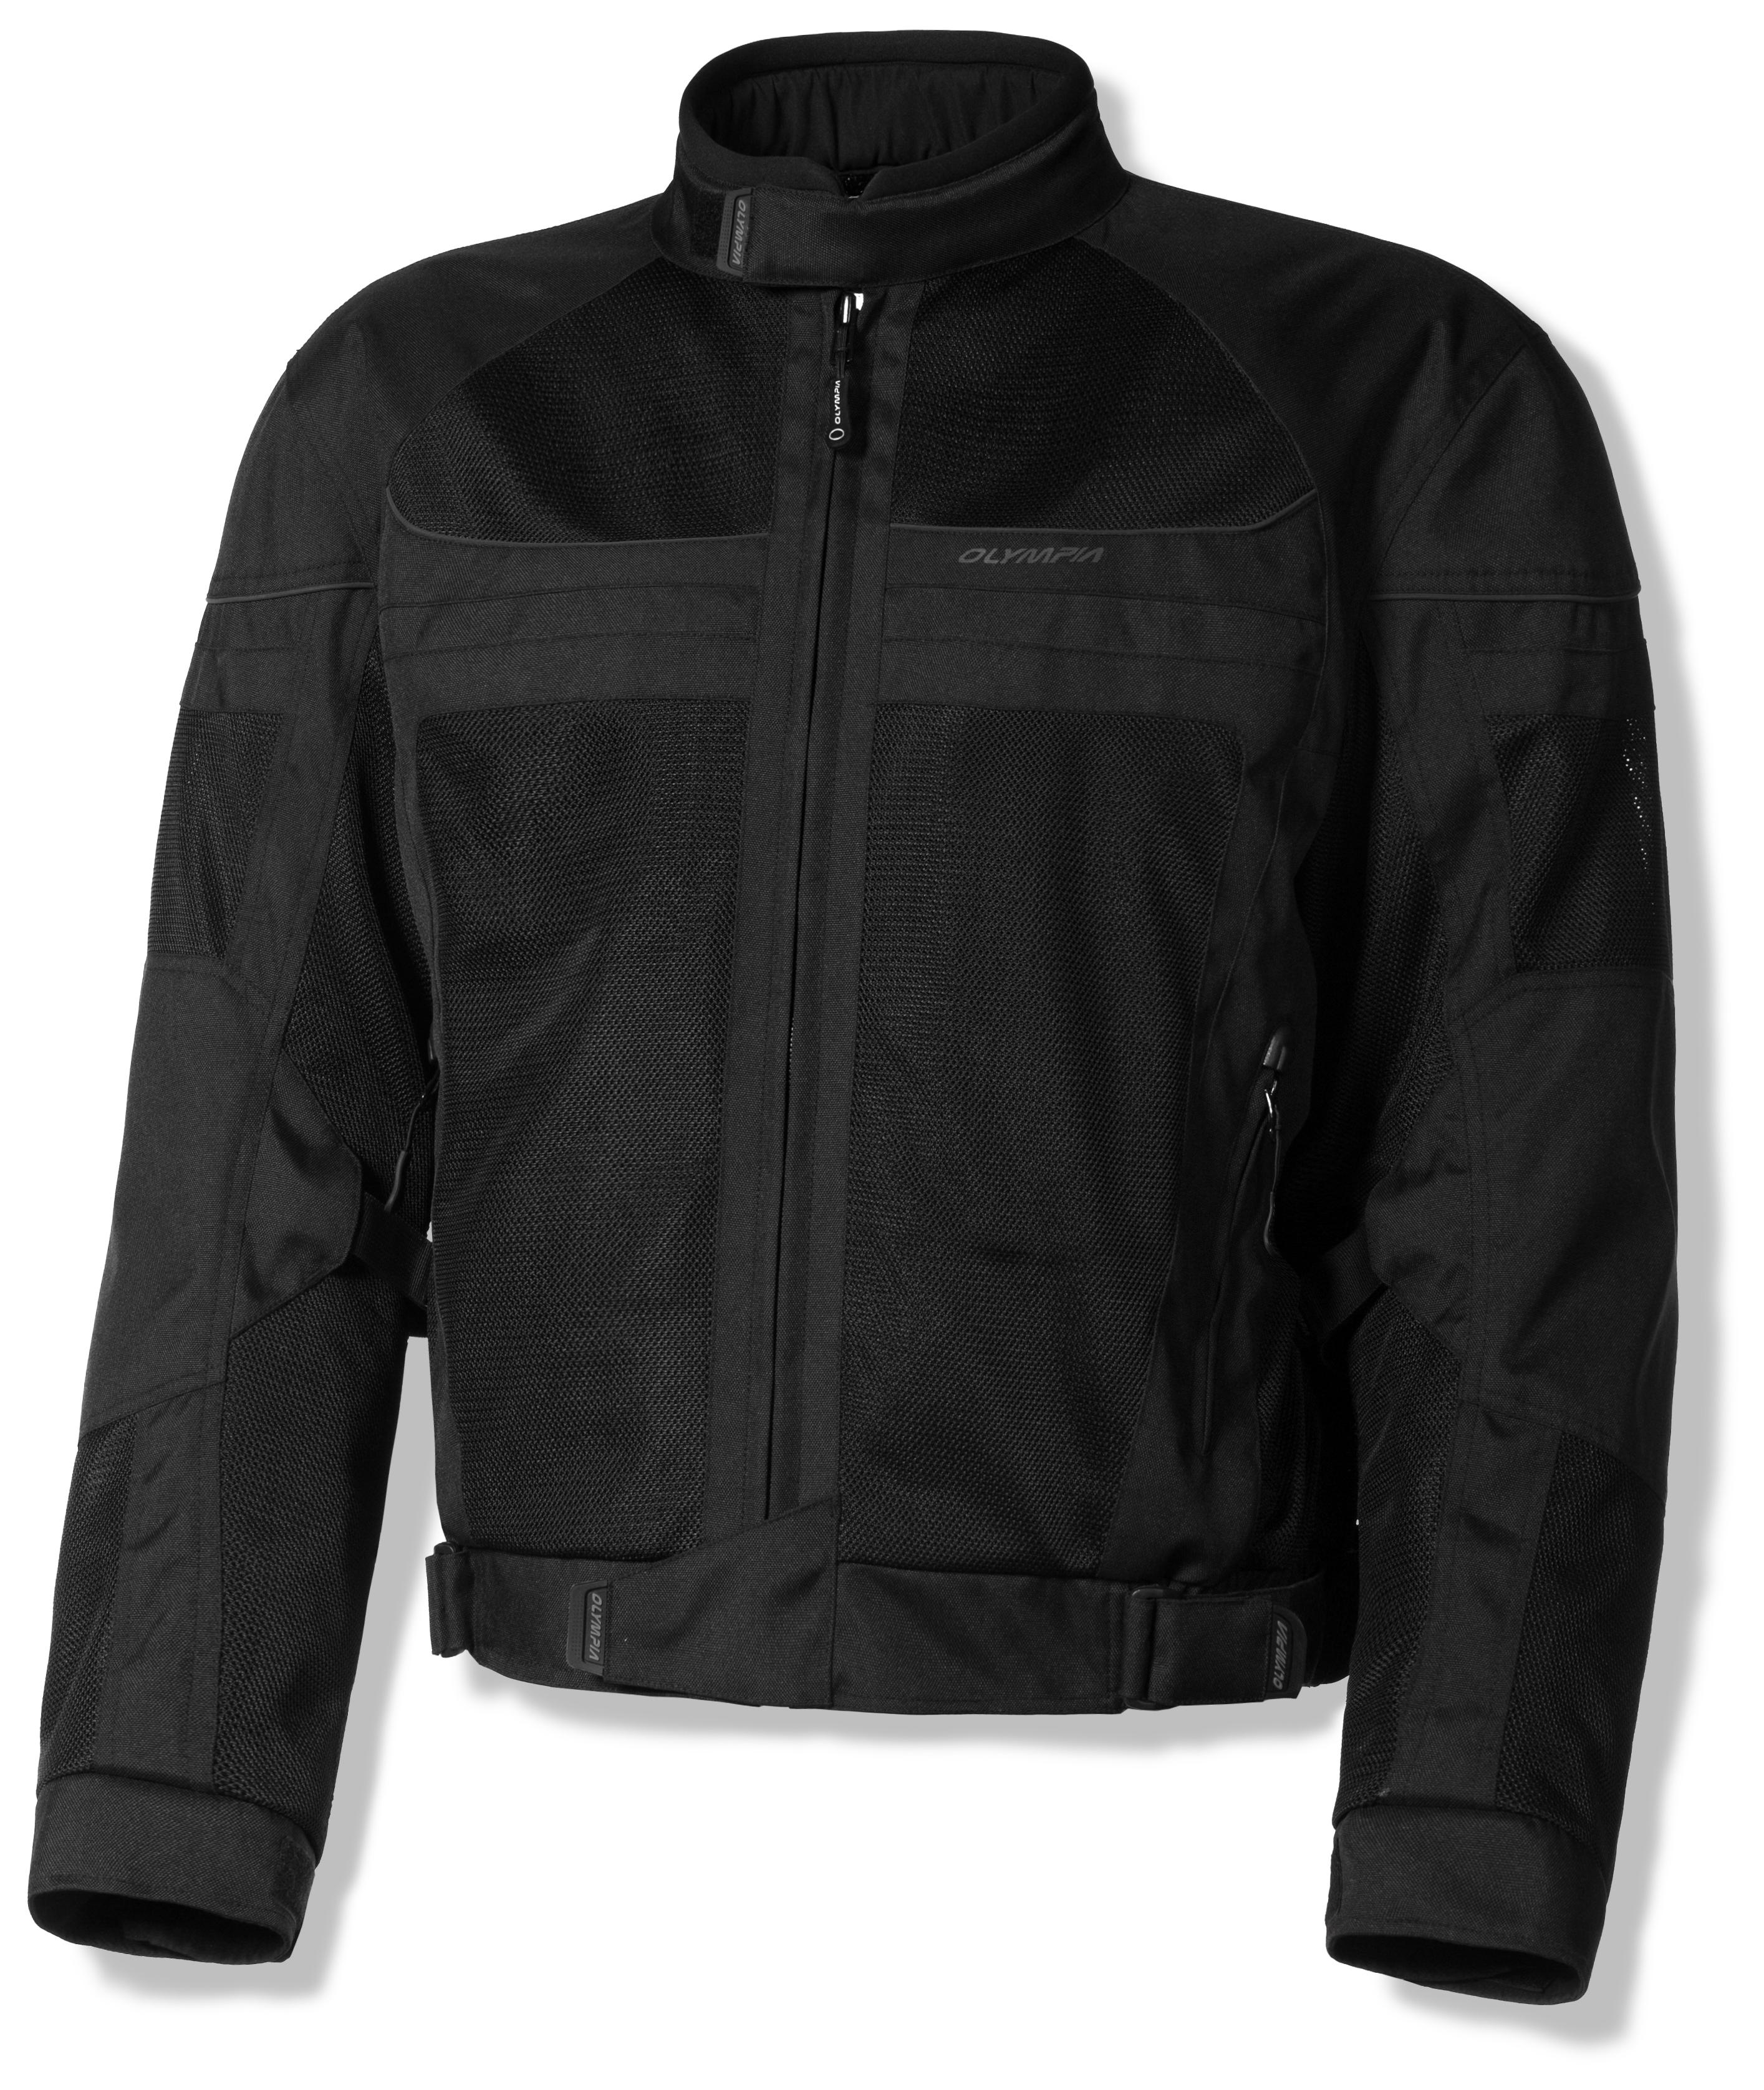 Olympia Newport Jacket Cycle Gear